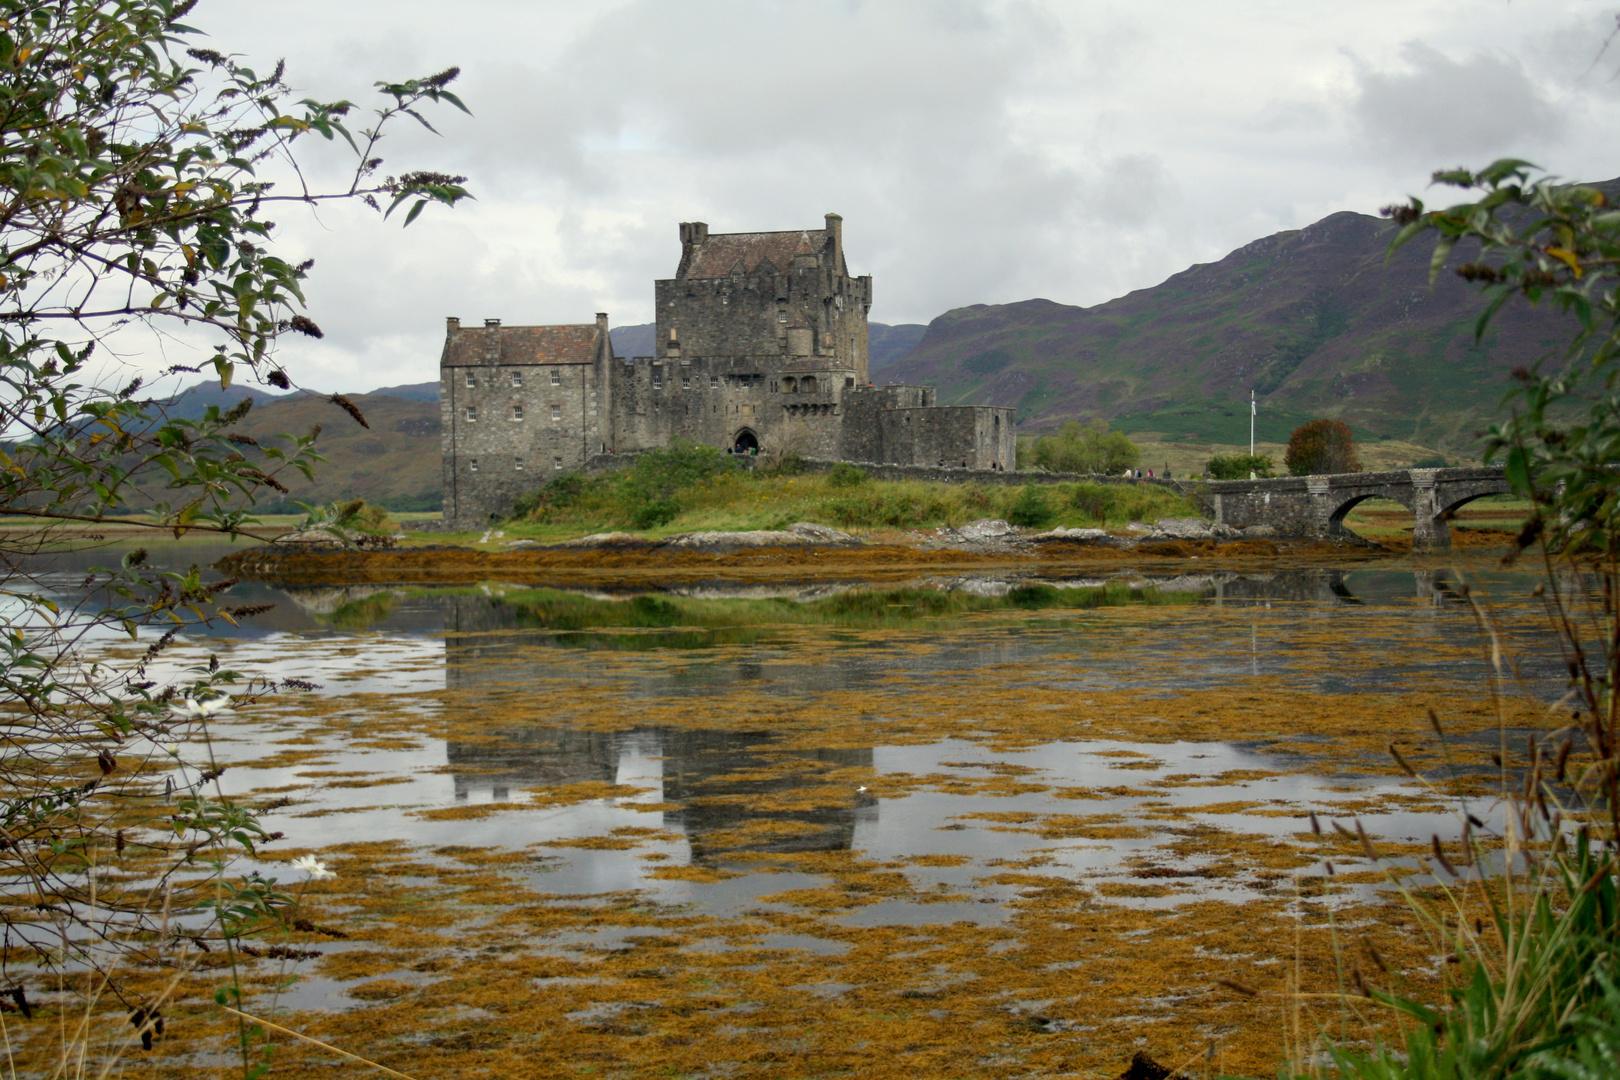 Schloß in Schottland